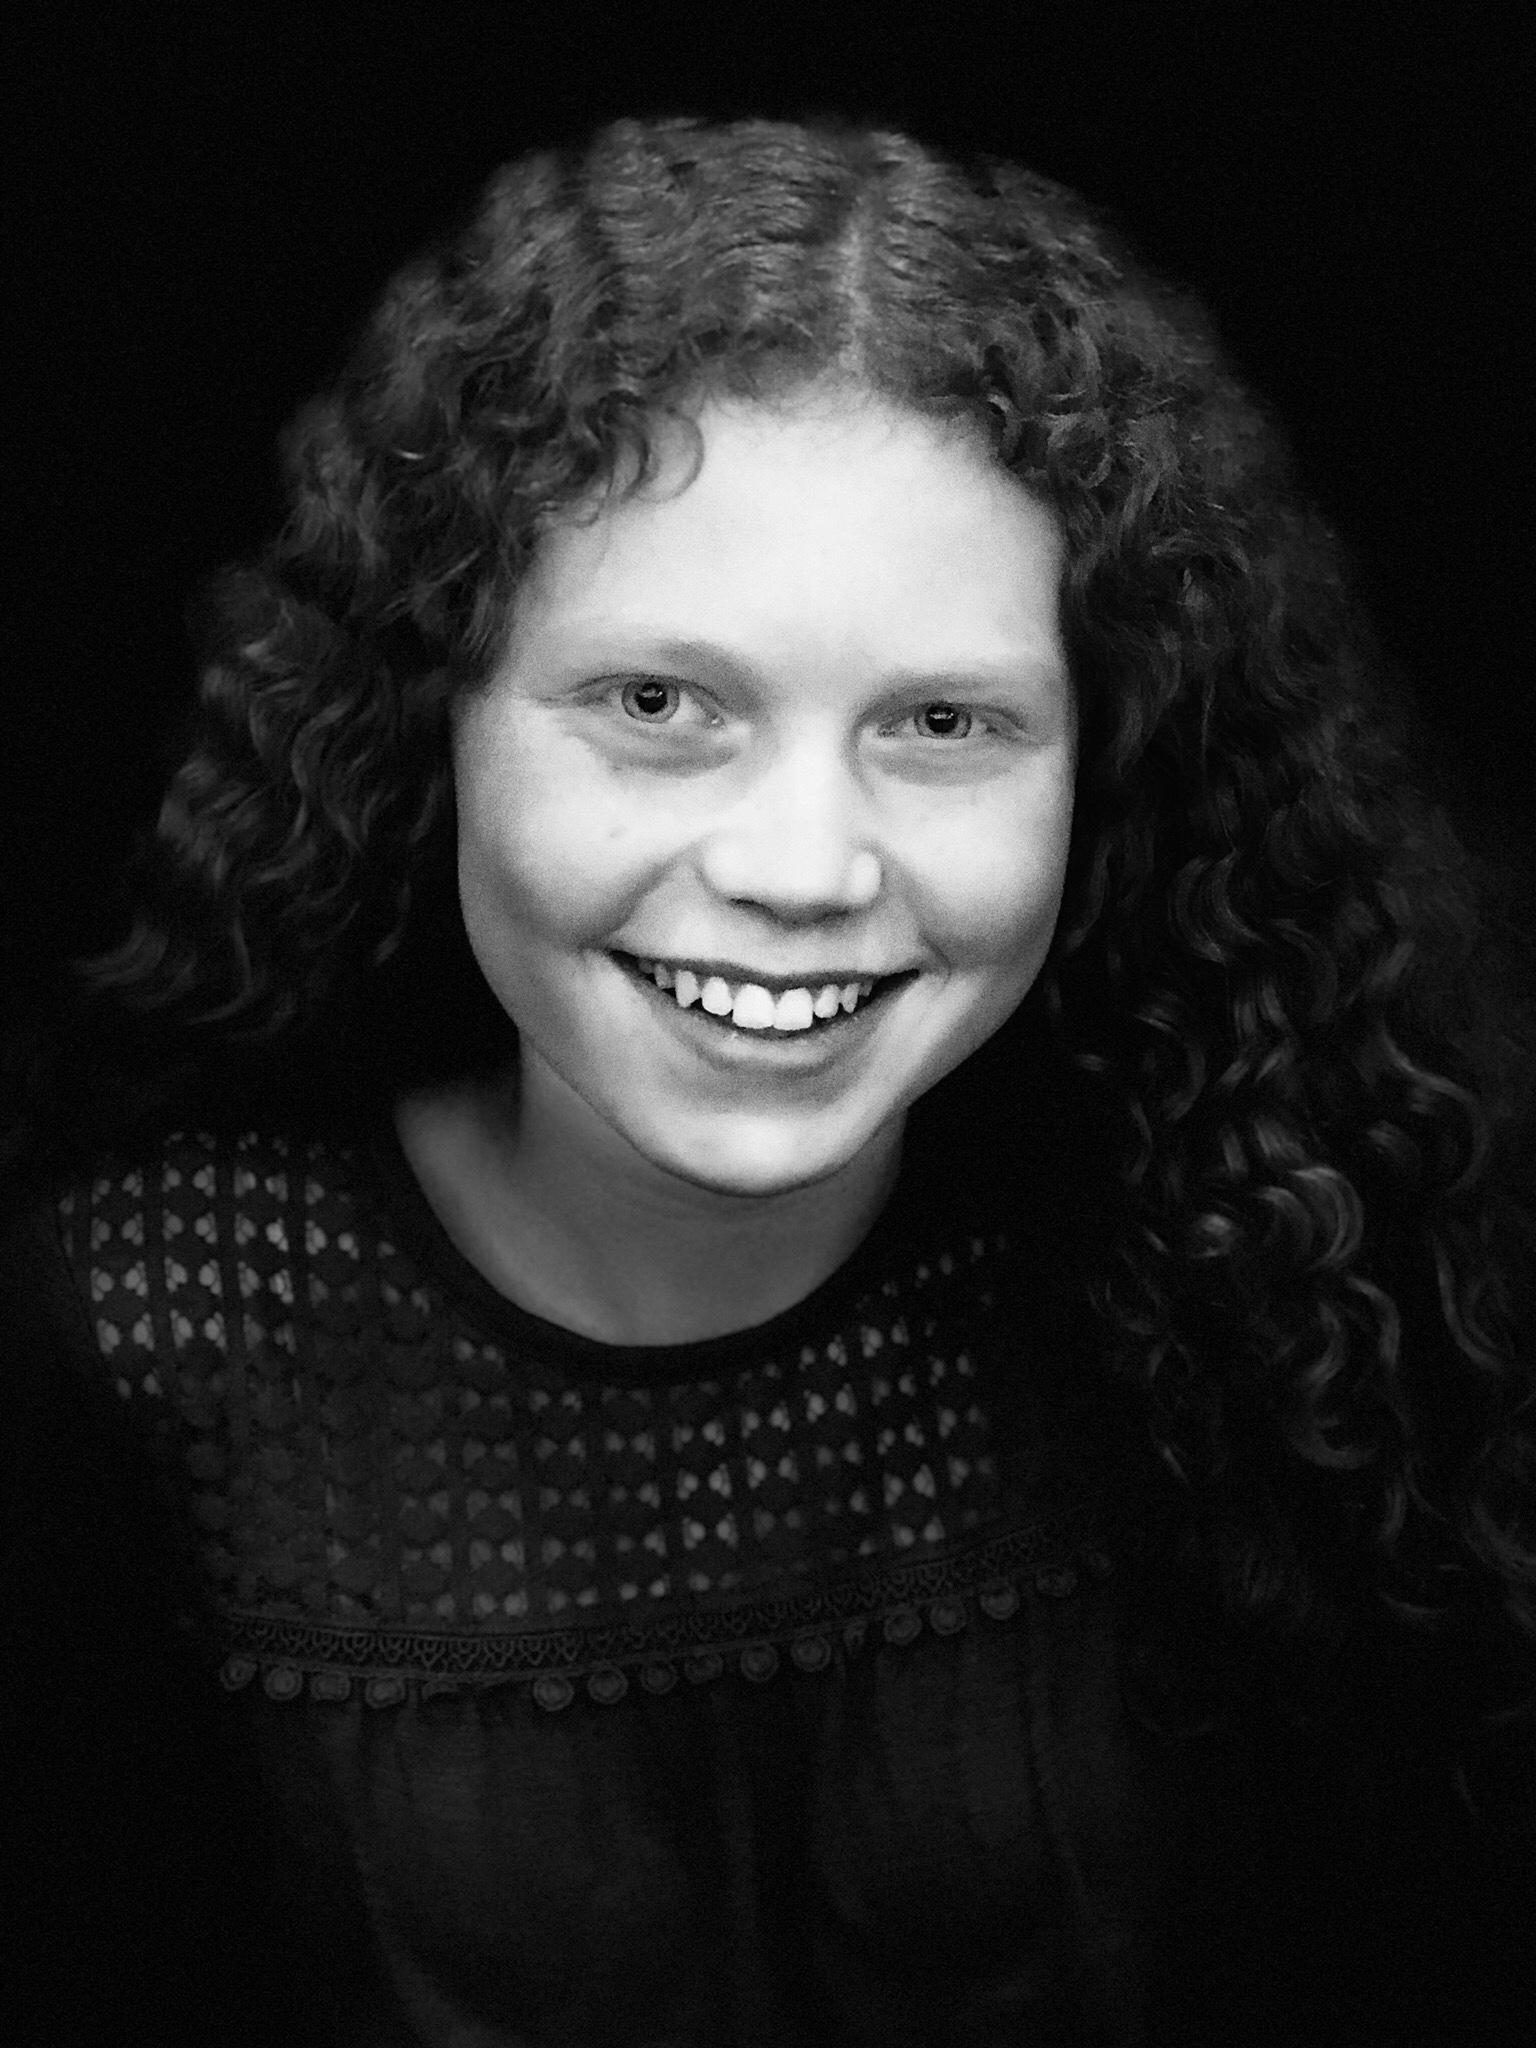 Claire Orriss